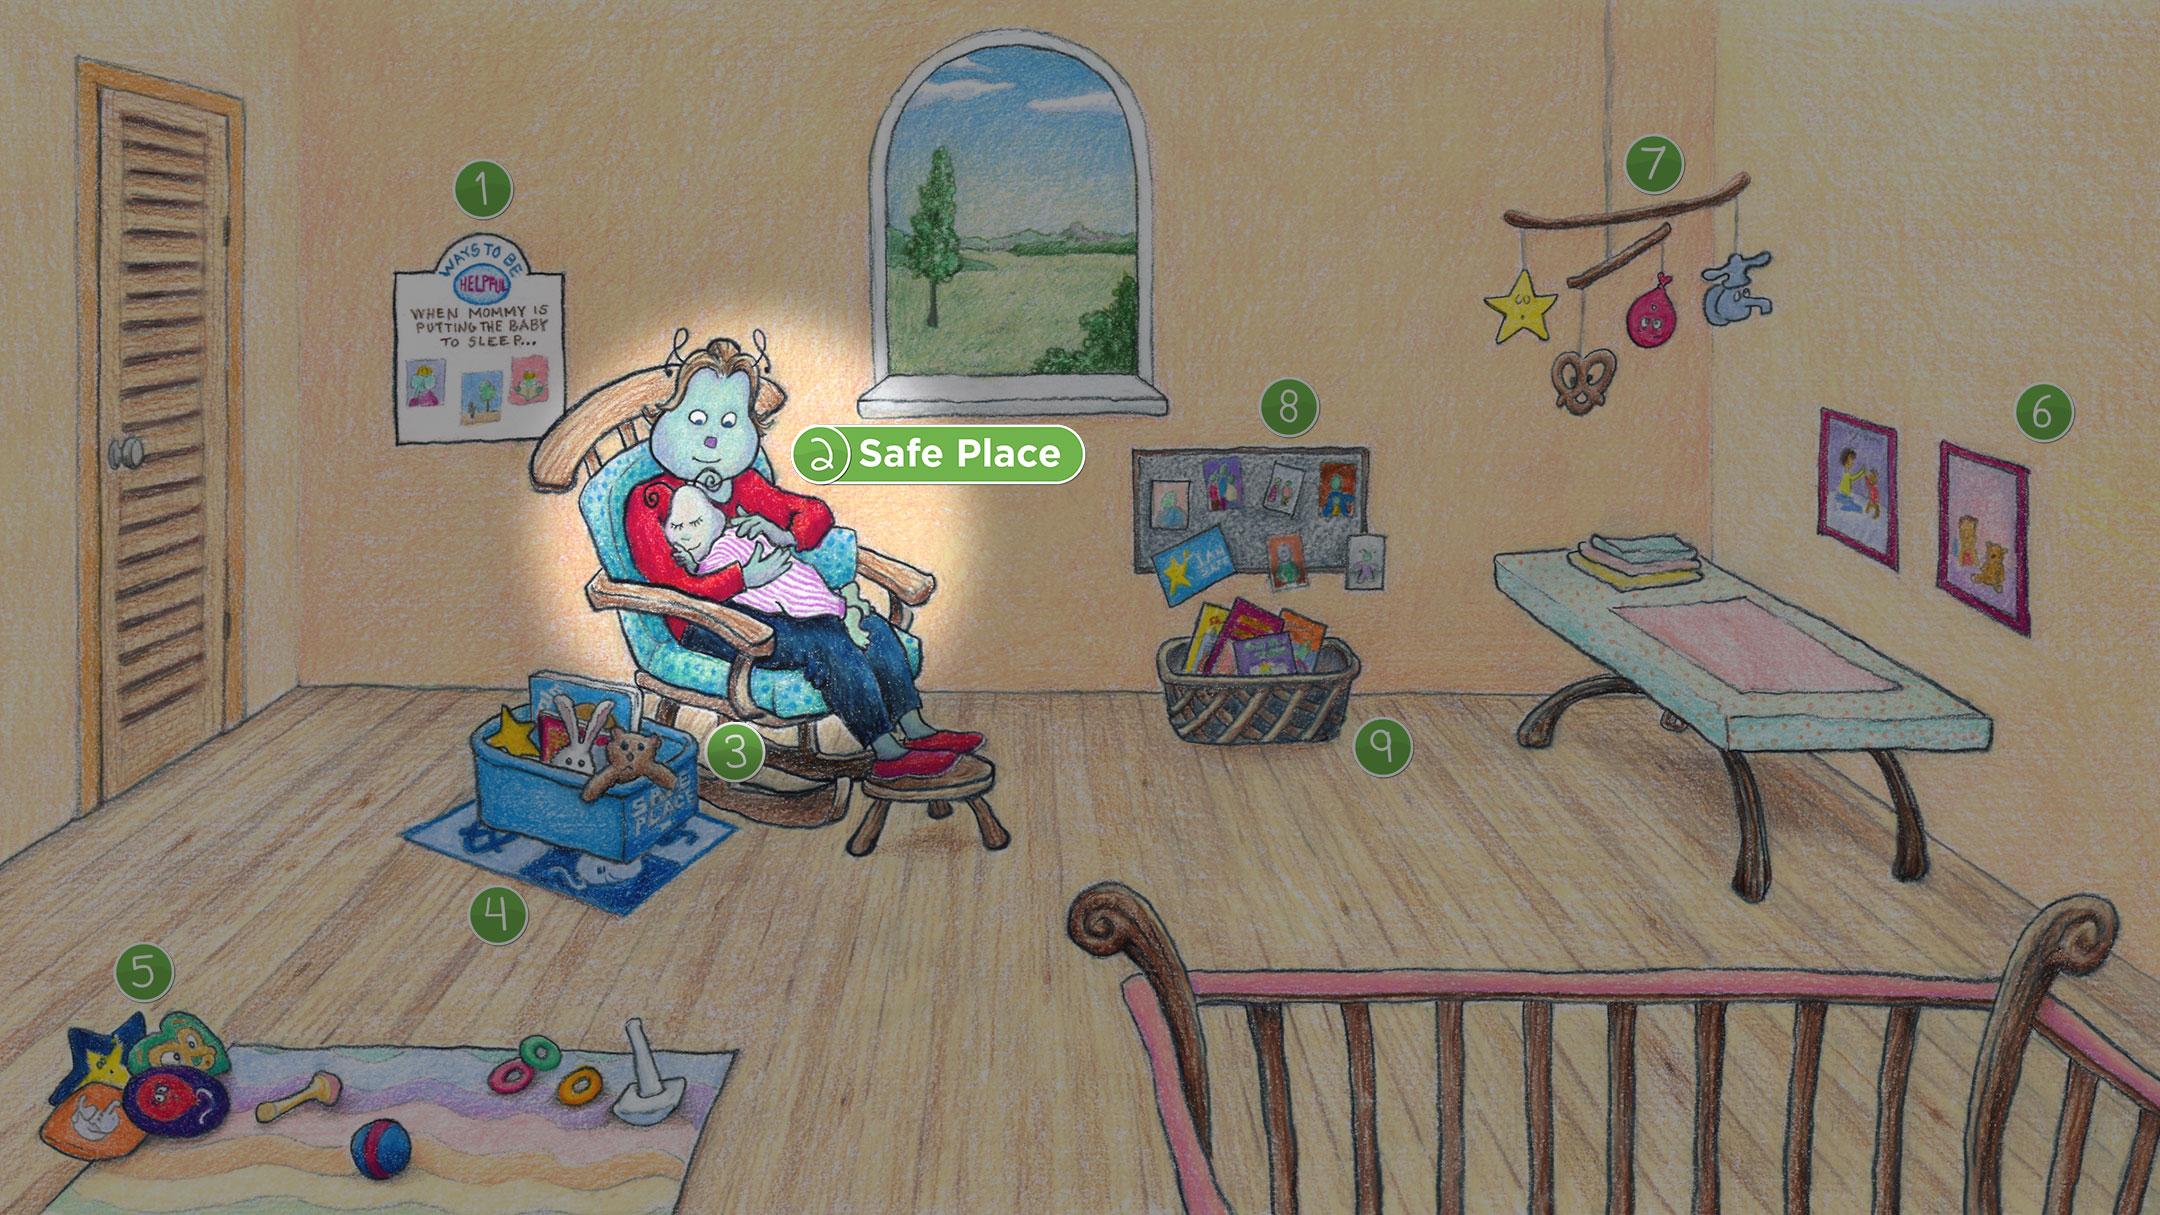 Nursery Room: Safe Place